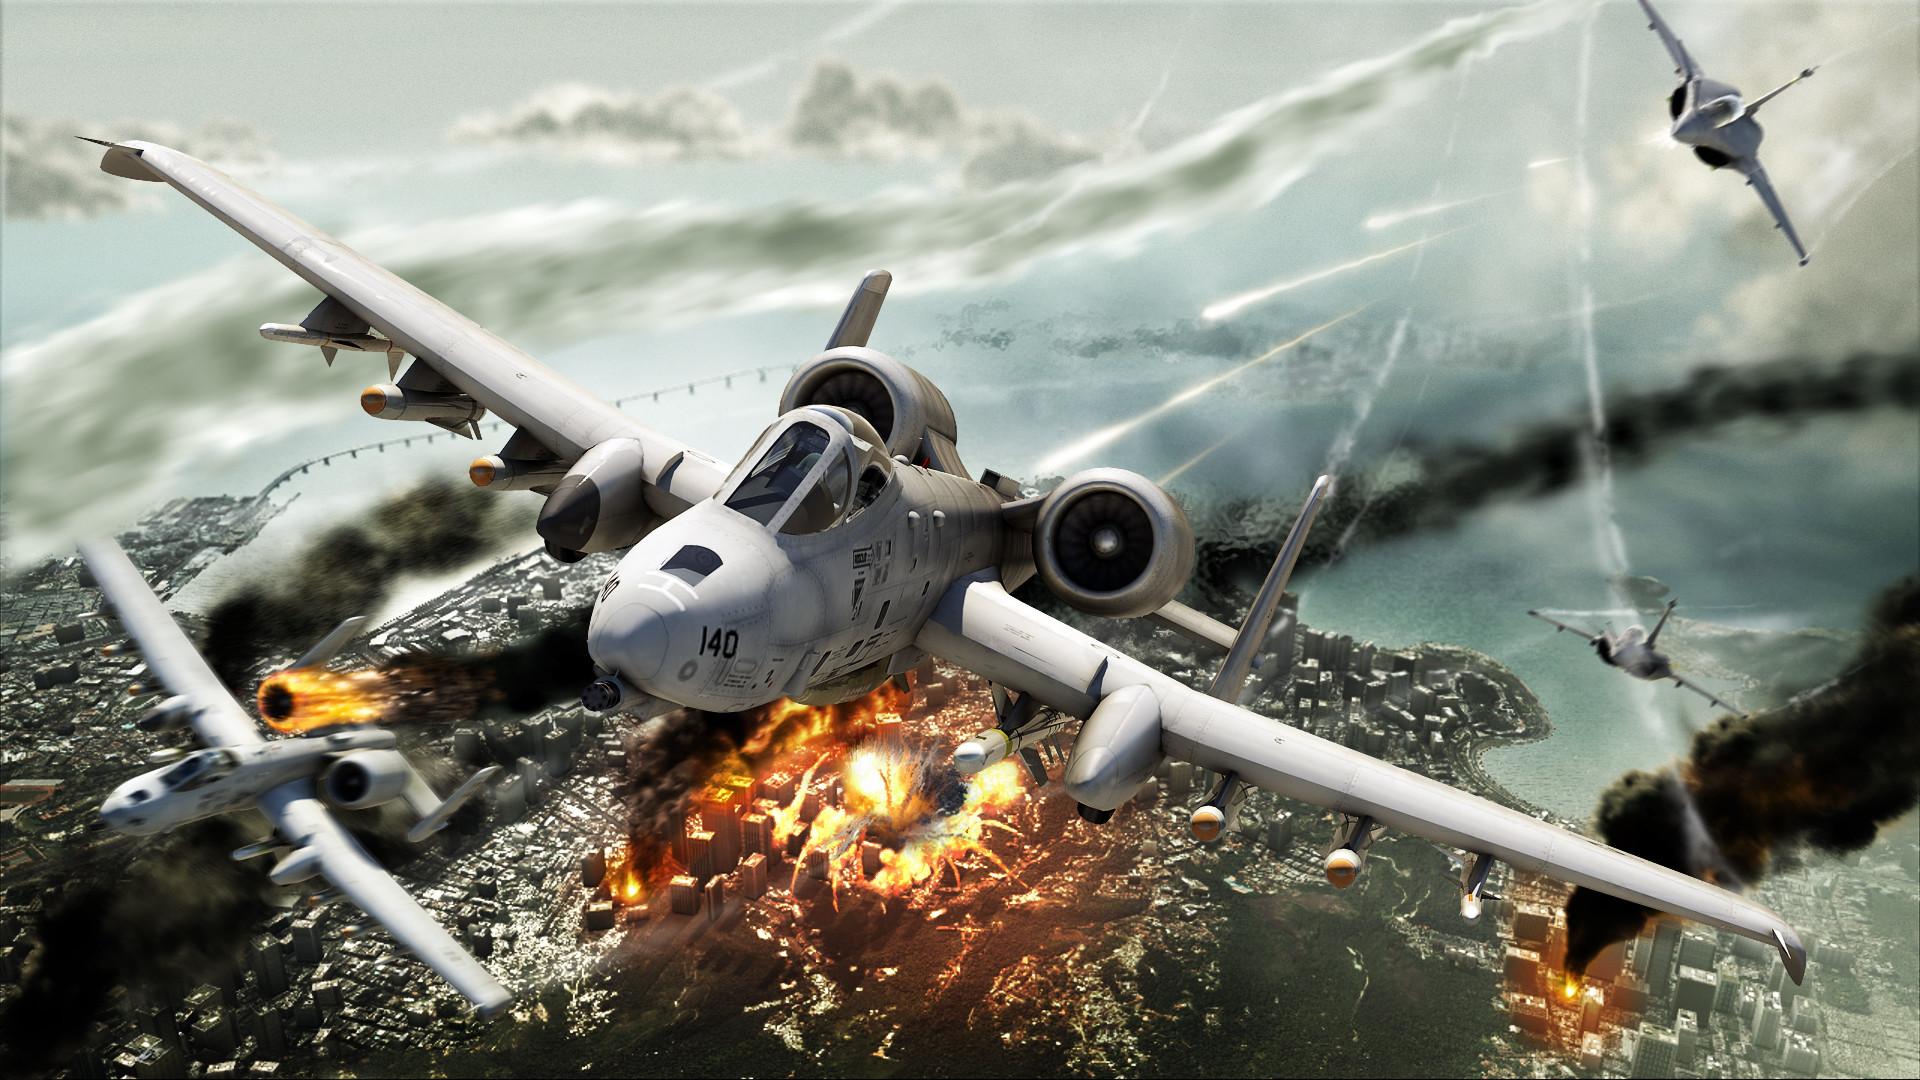 Fairchild Republic A-10 Thunderbolt II | I n f o r m a t i o n 2 S h a .